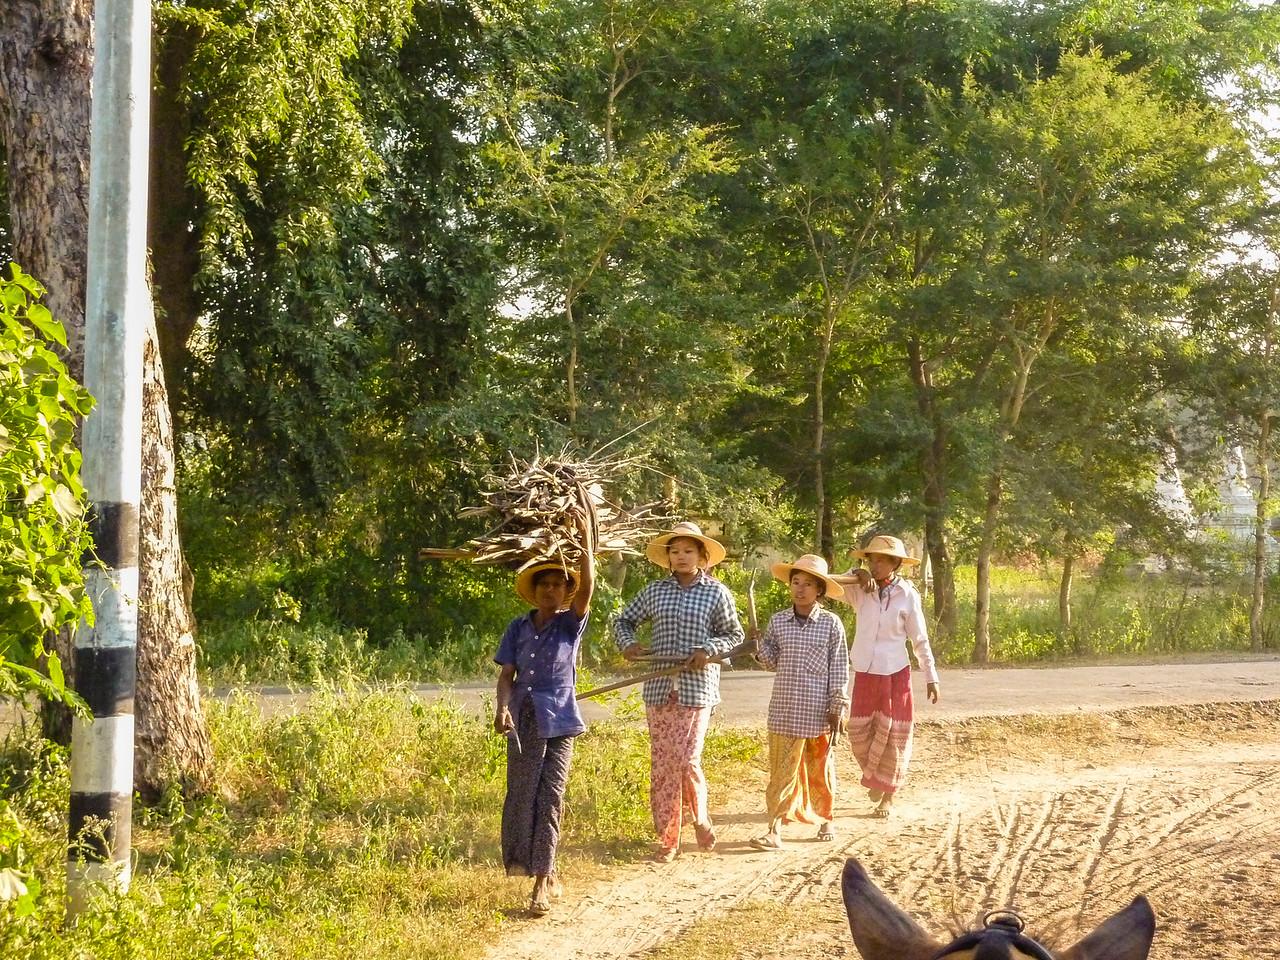 Sights in Bagan, Myanmar, 2009